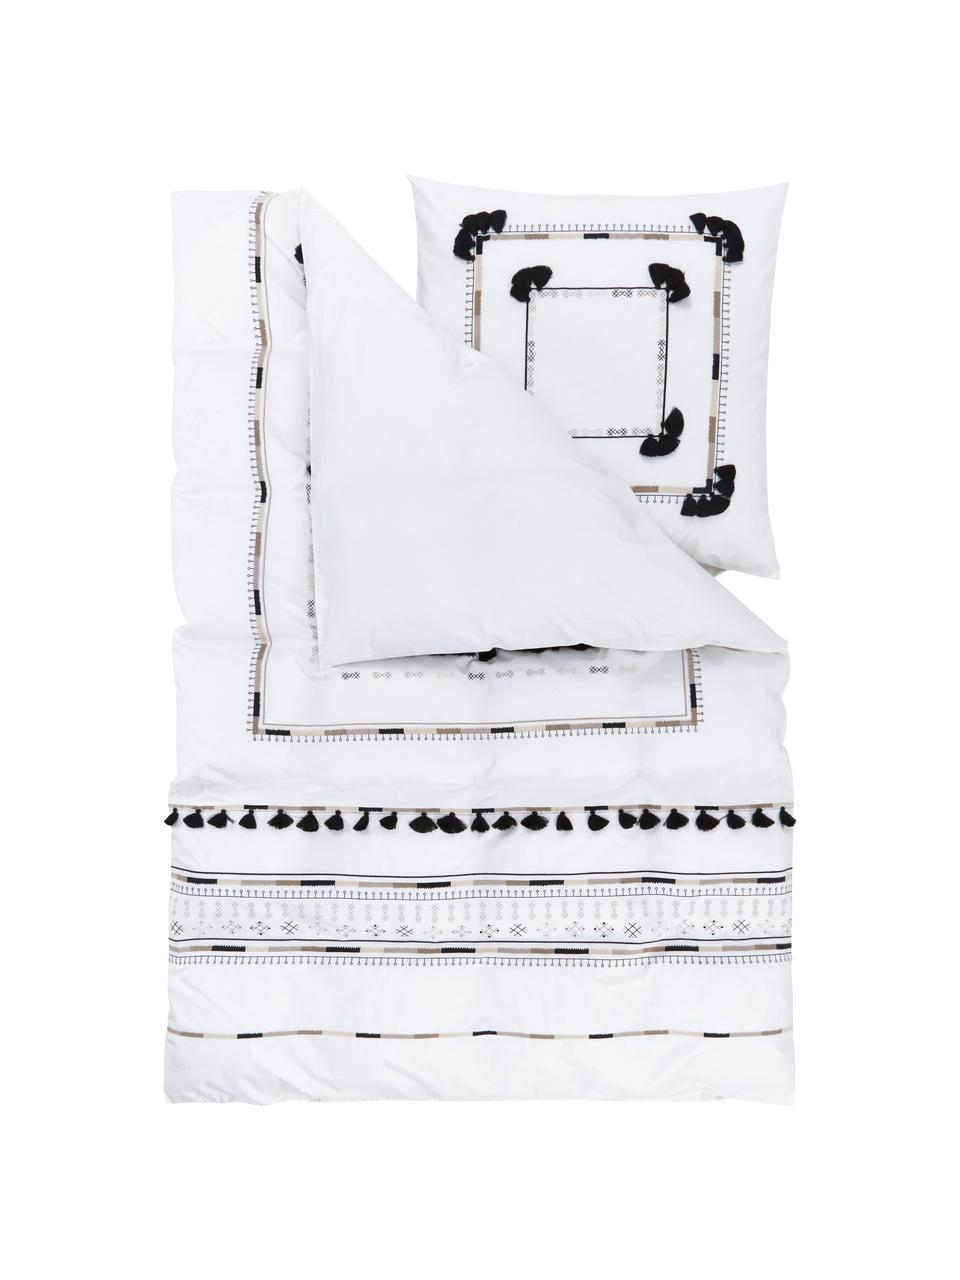 Bestickte Baumwollperkal-Bettwäsche Inda mit Quasten, Webart: Perkal Fadendichte 200 TC, Weiß, 240 x 220 cm + 2 Kissen 80 x 80 cm